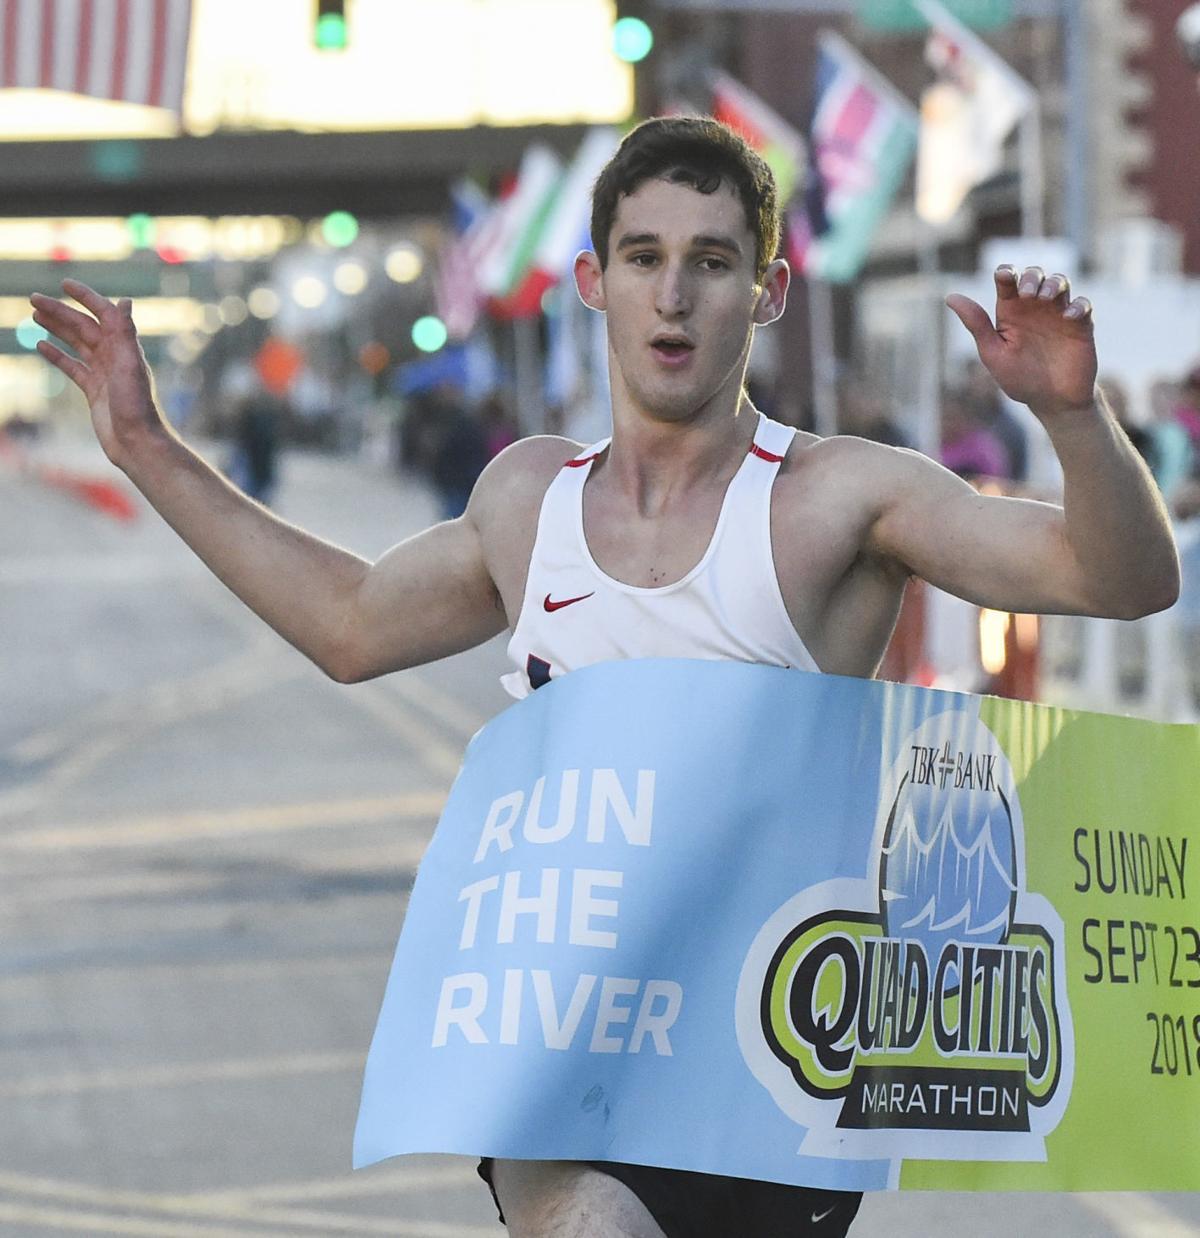 092318-qc-marathon-jg-01a.jpg